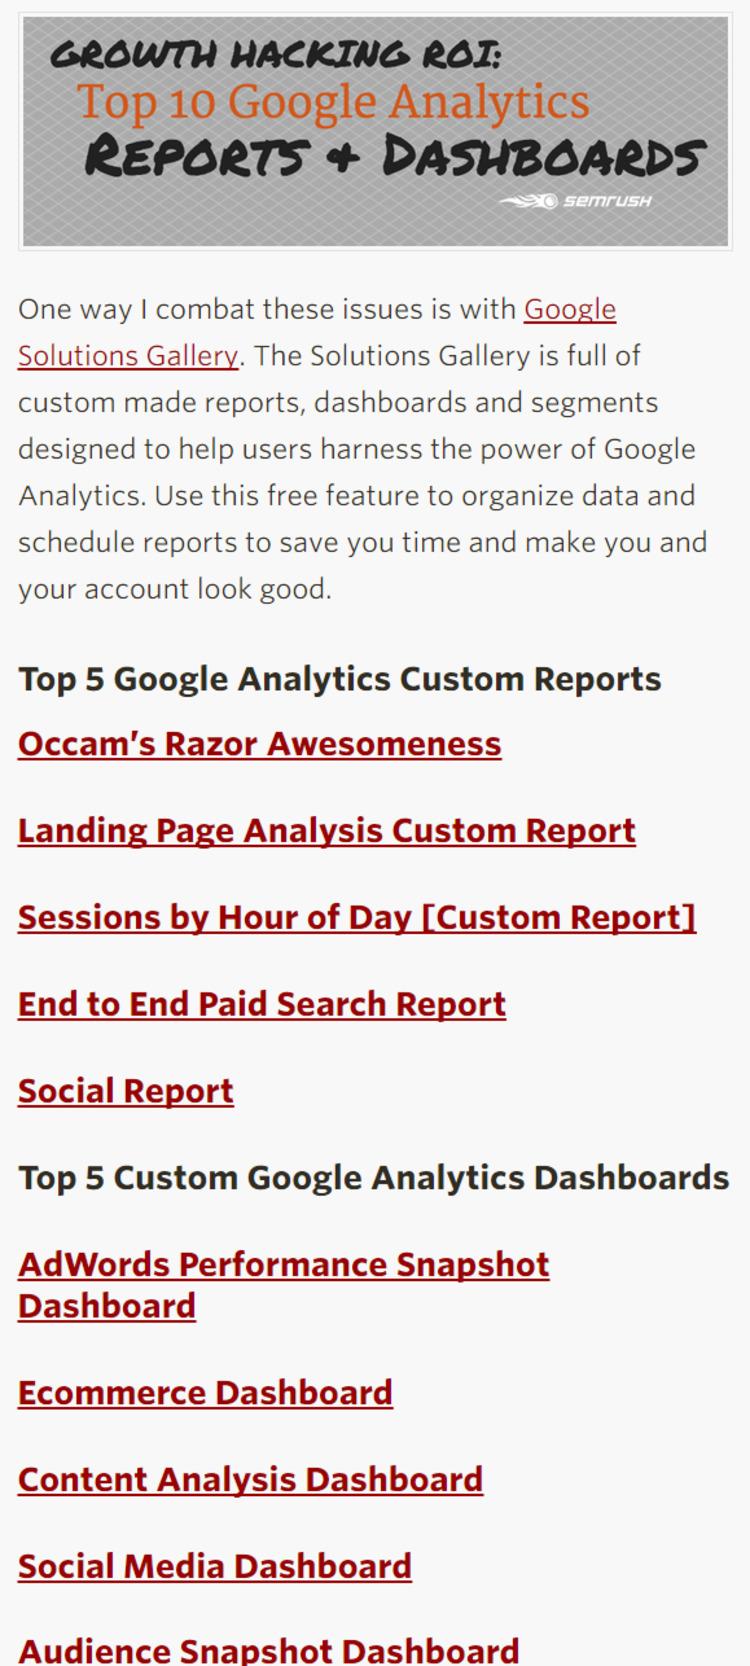 Growth Hacking ROI: Top 10 Google Analytics Reports - SEMrush   The Marketing Technology Alert   Scoop.it